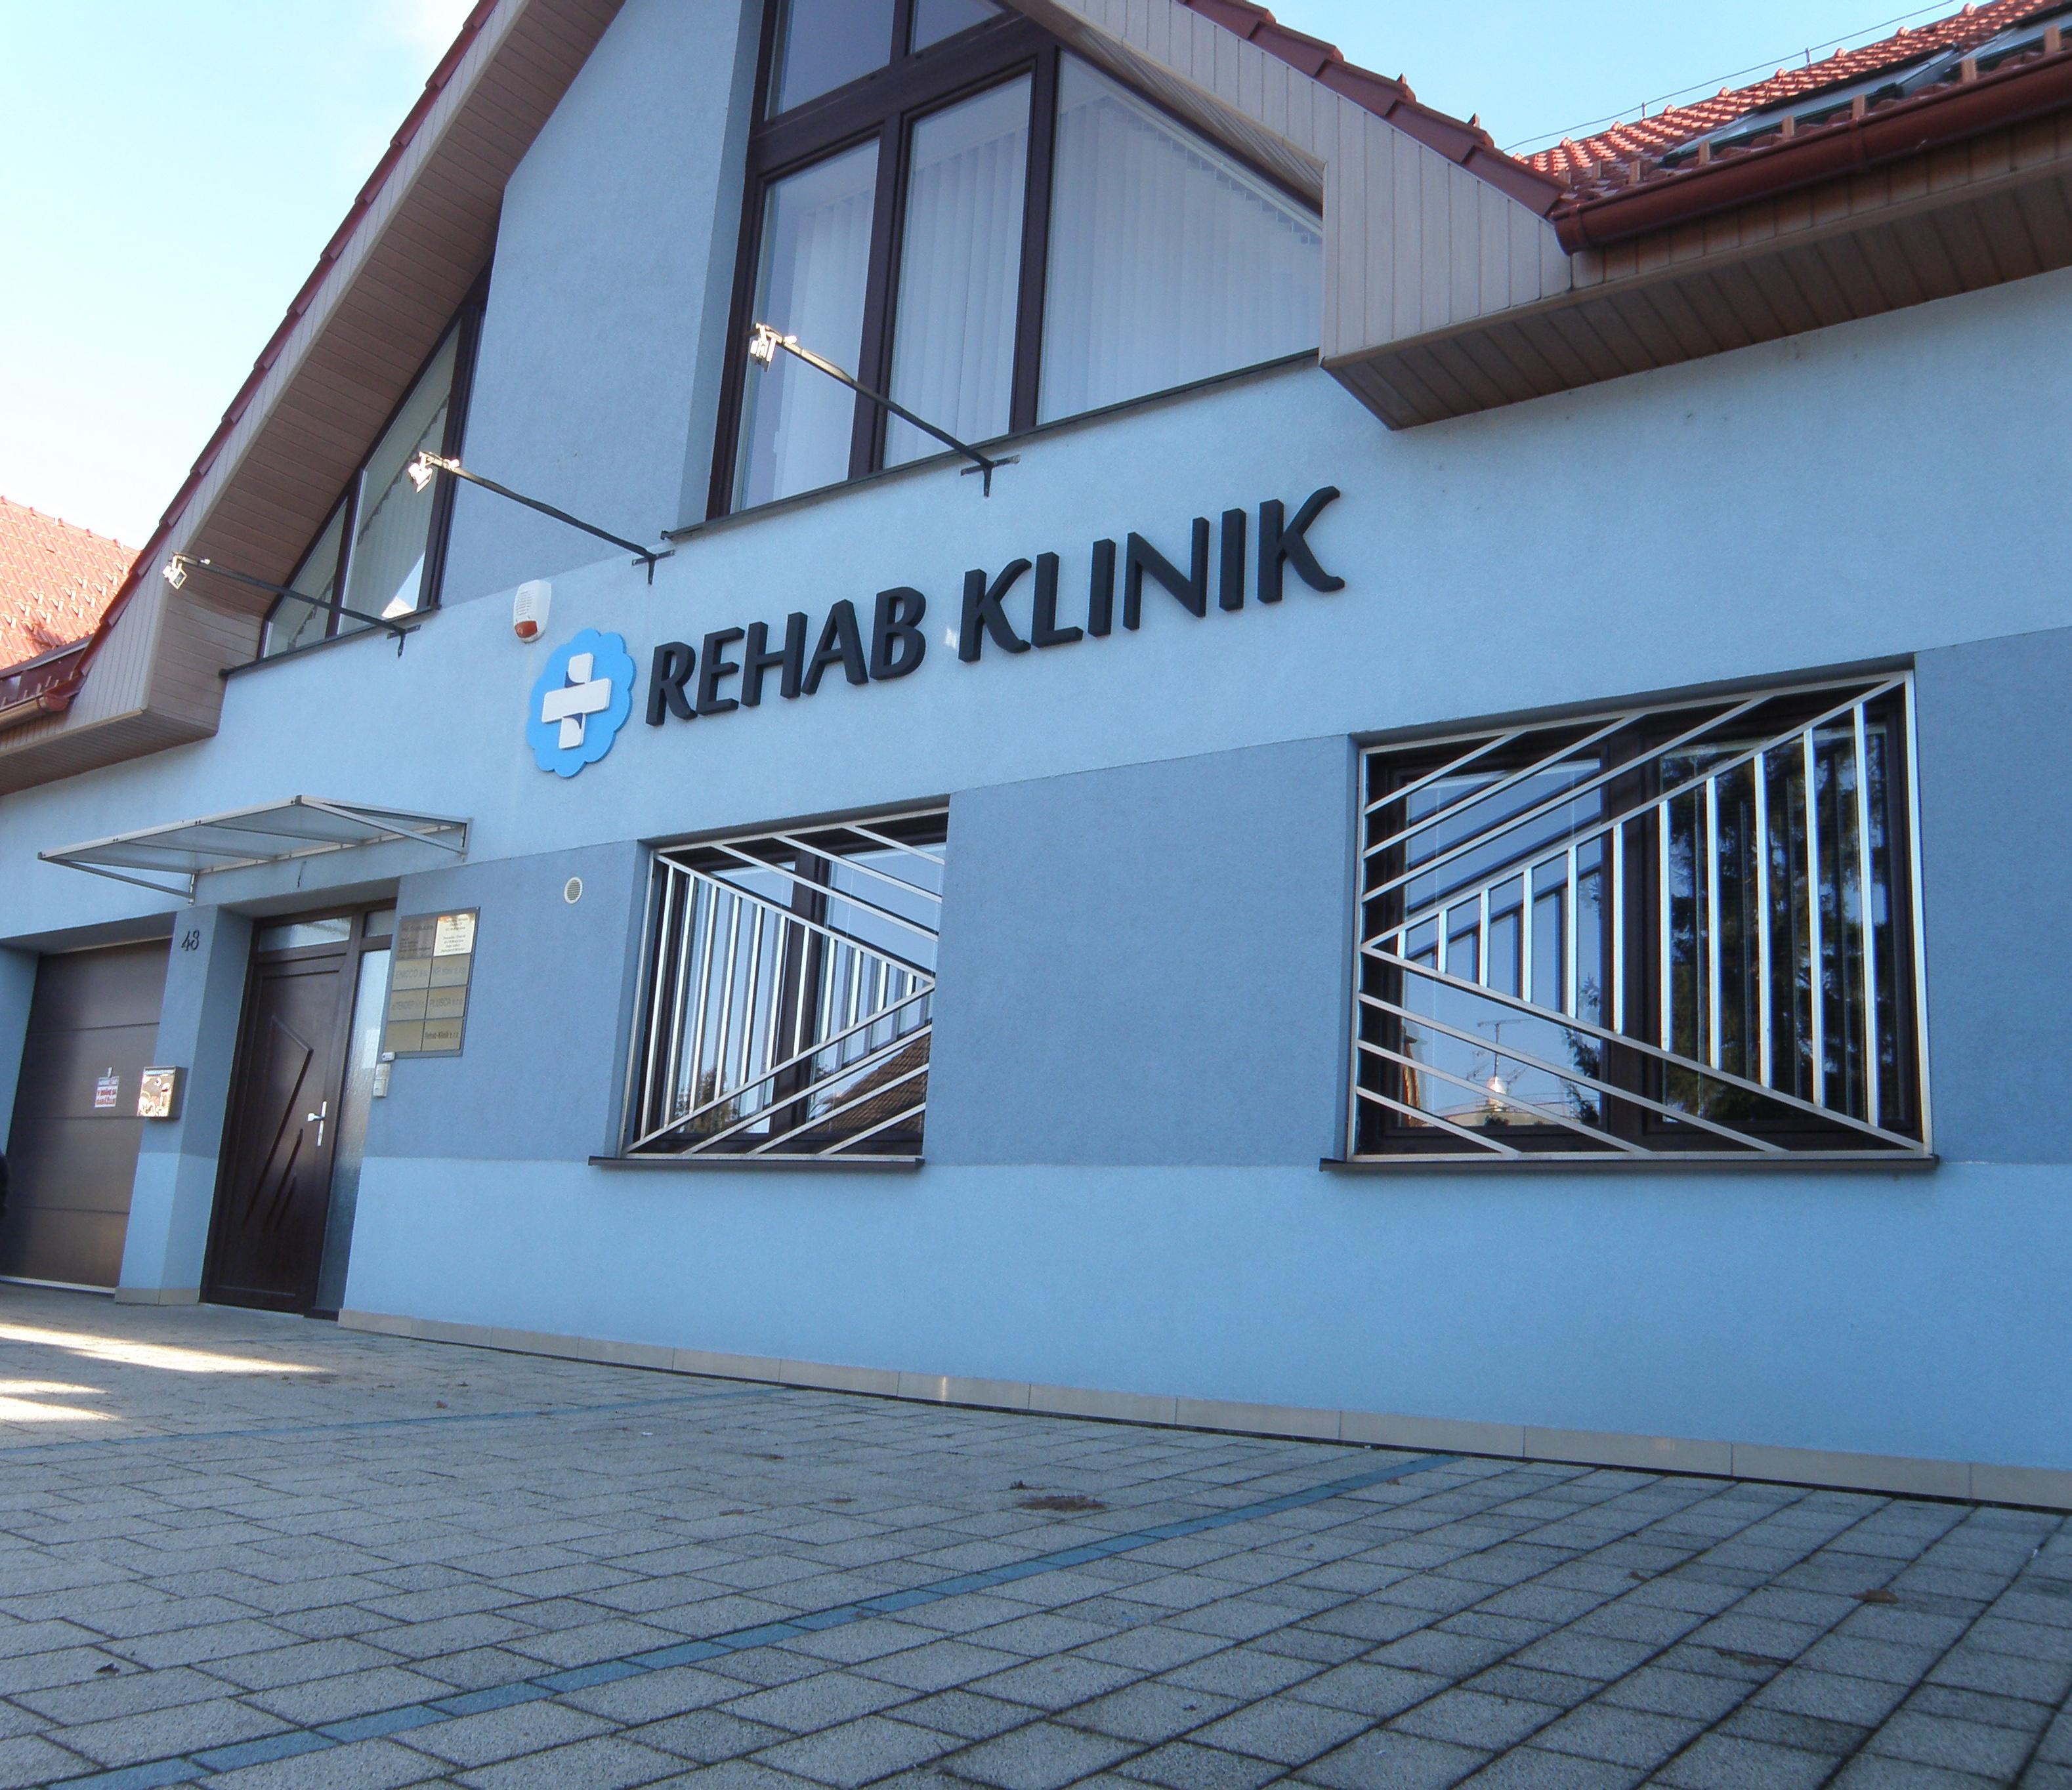 Rehab-Klinik, s.r.o.